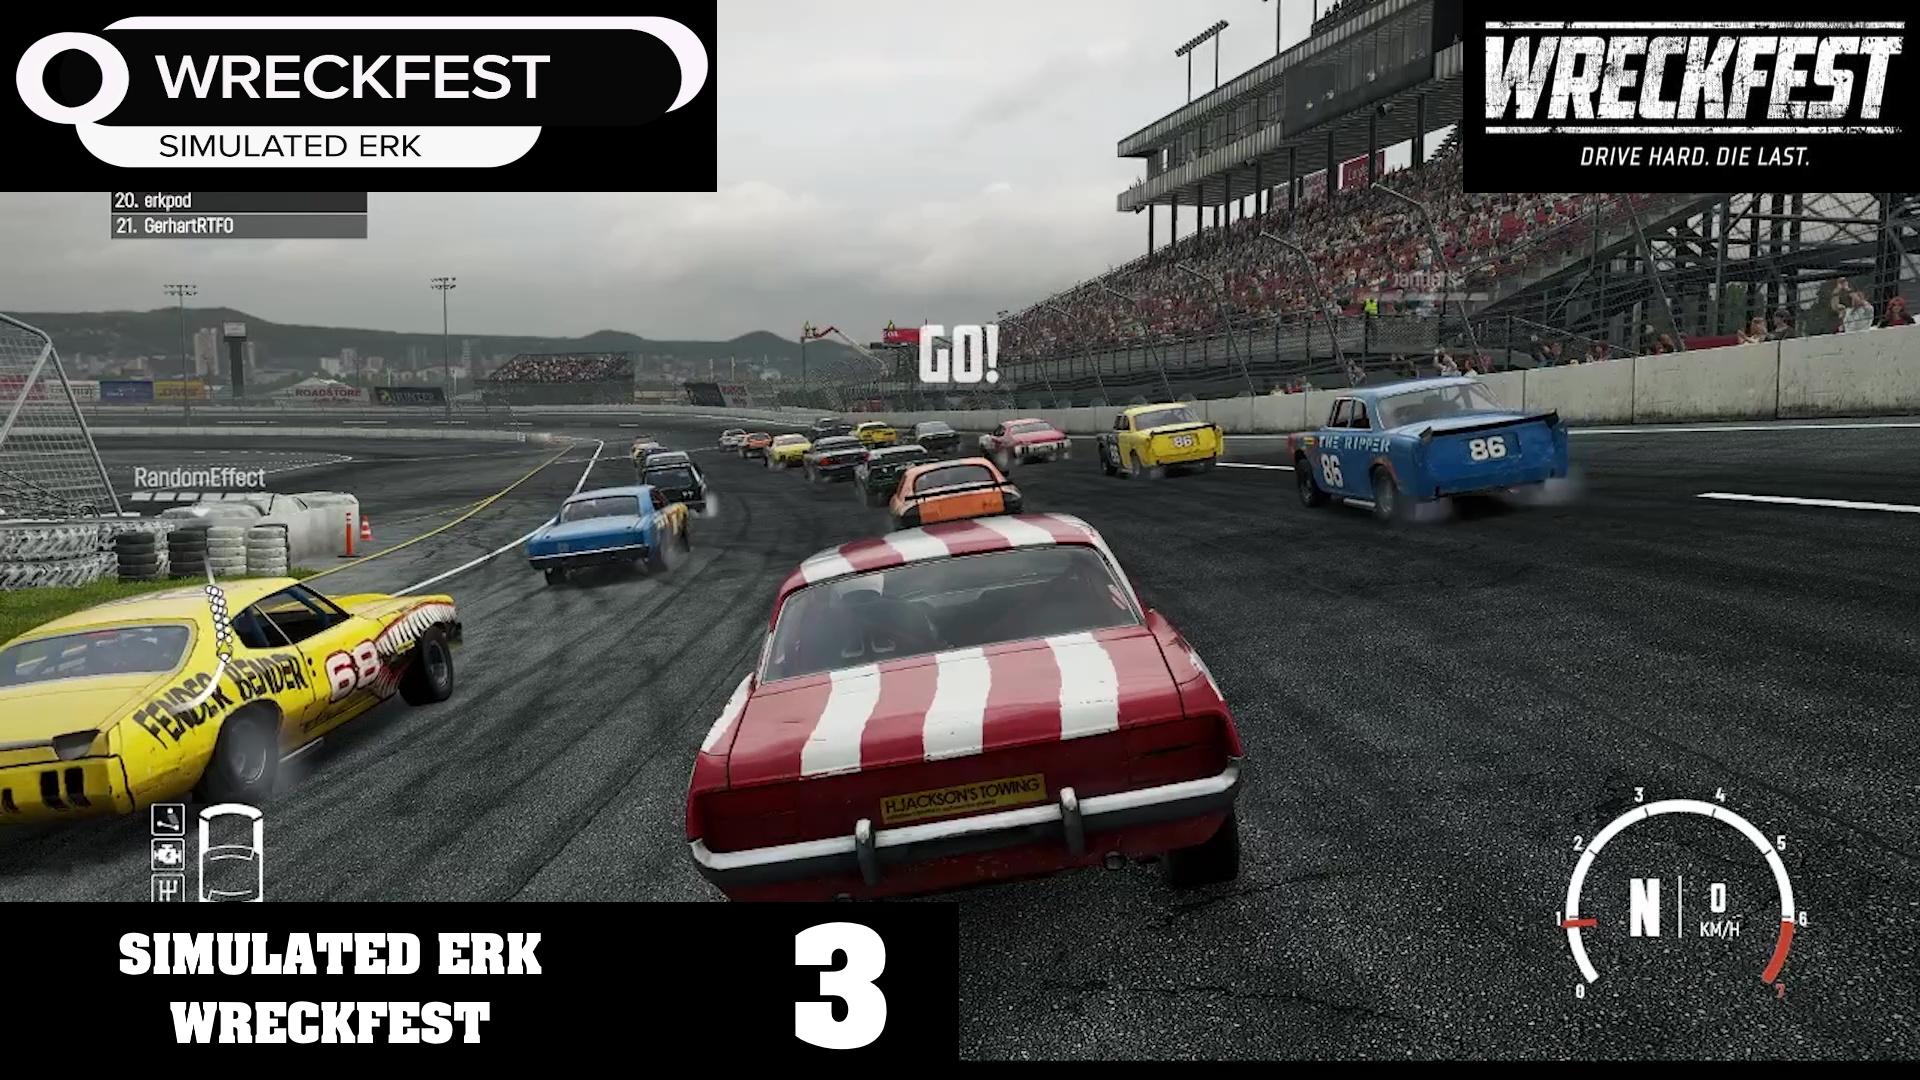 Simulated Erk: Wreckfest episode 3 | Here For The Carnage